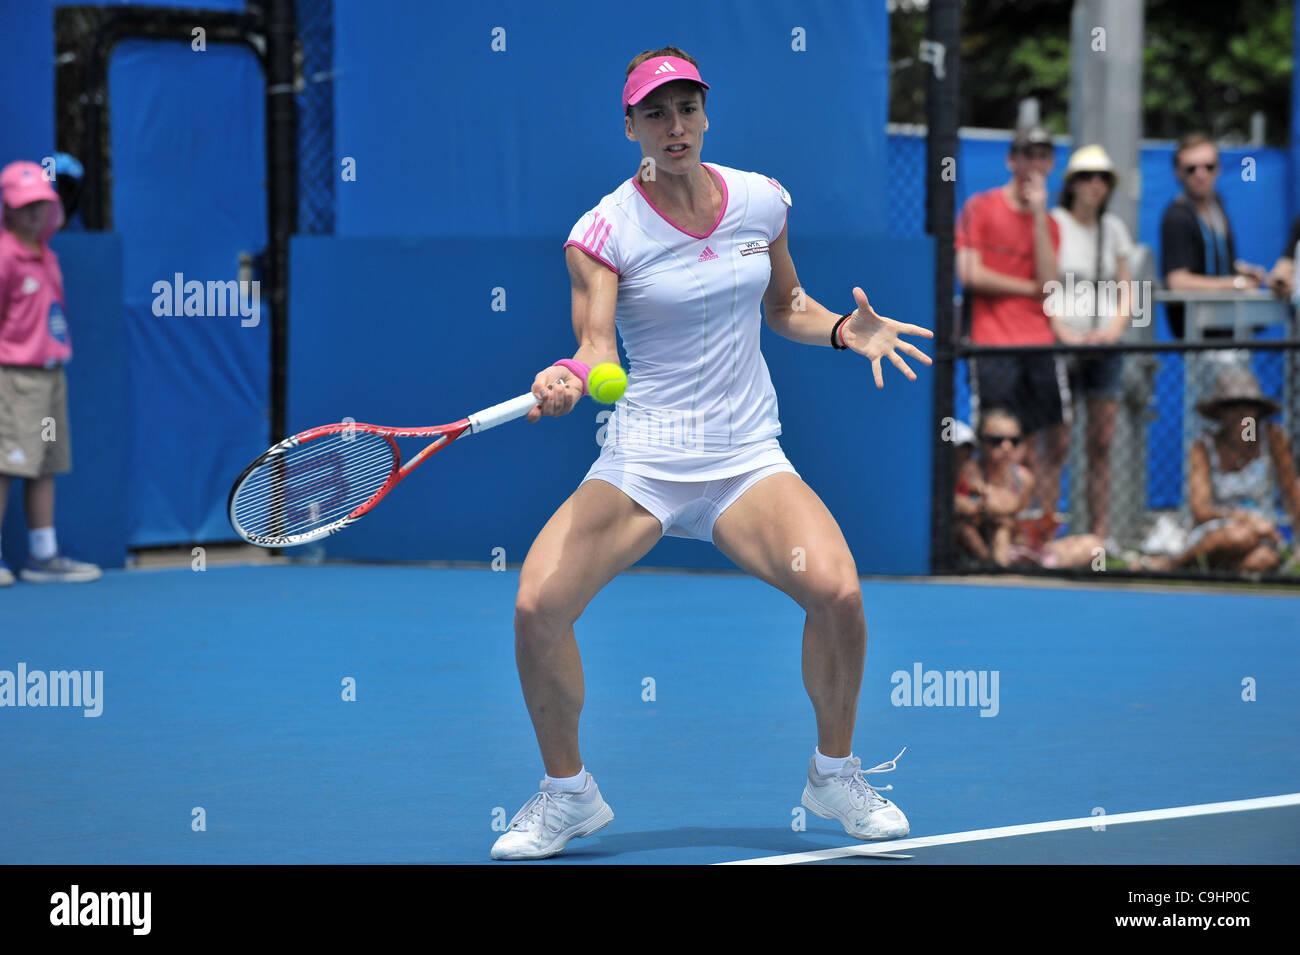 Pavlyuchenkova During The Apia International Sydney Tennis Tournament Australian Open Series At Olympic Park CentreHomebush